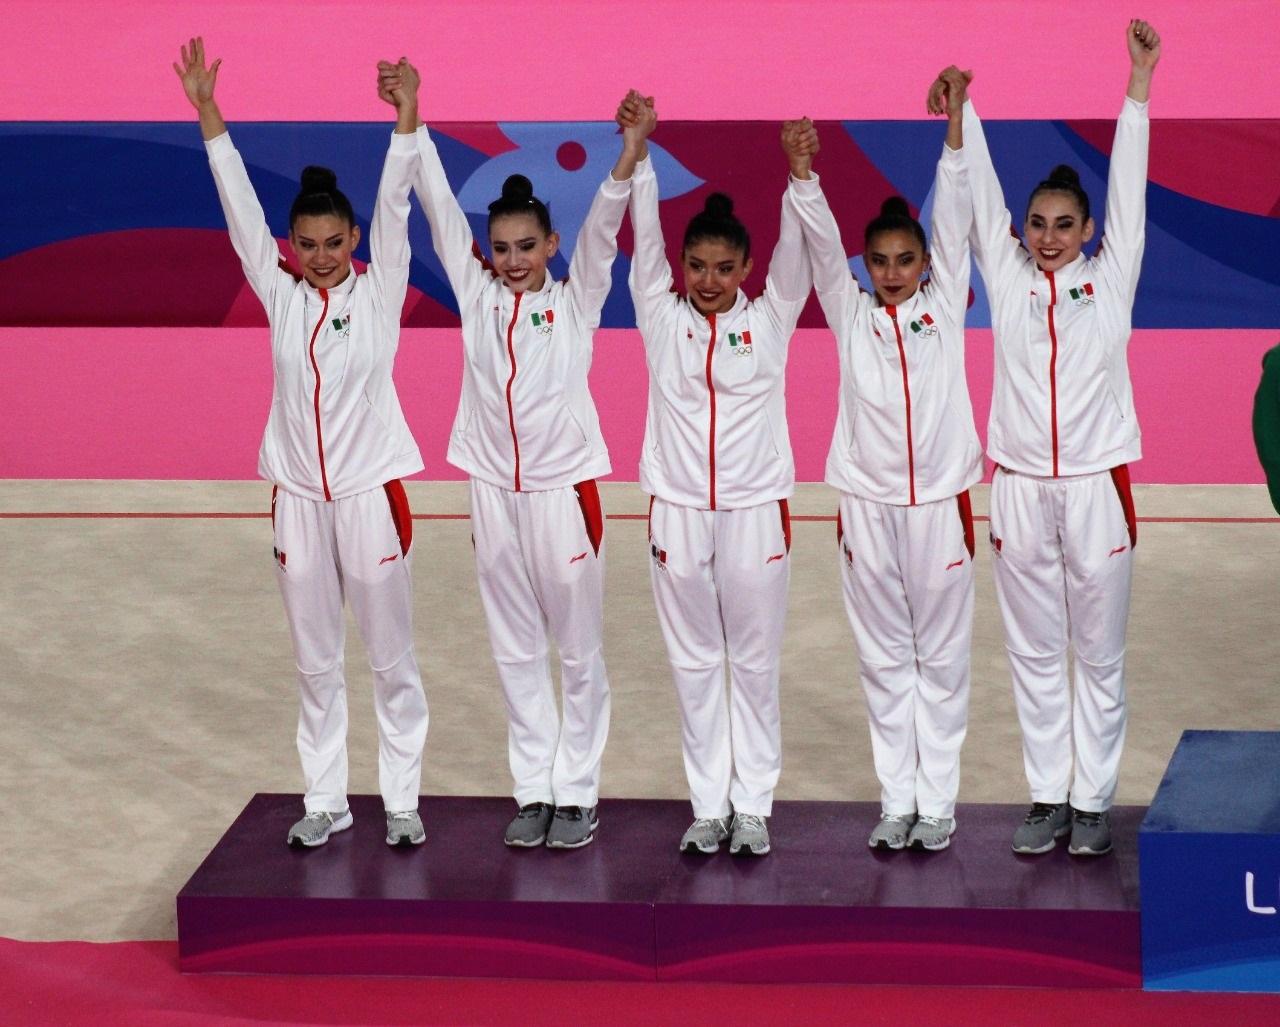 Gimnasia rítmica cierra con broche de plata actuación histórica en Lima 2019